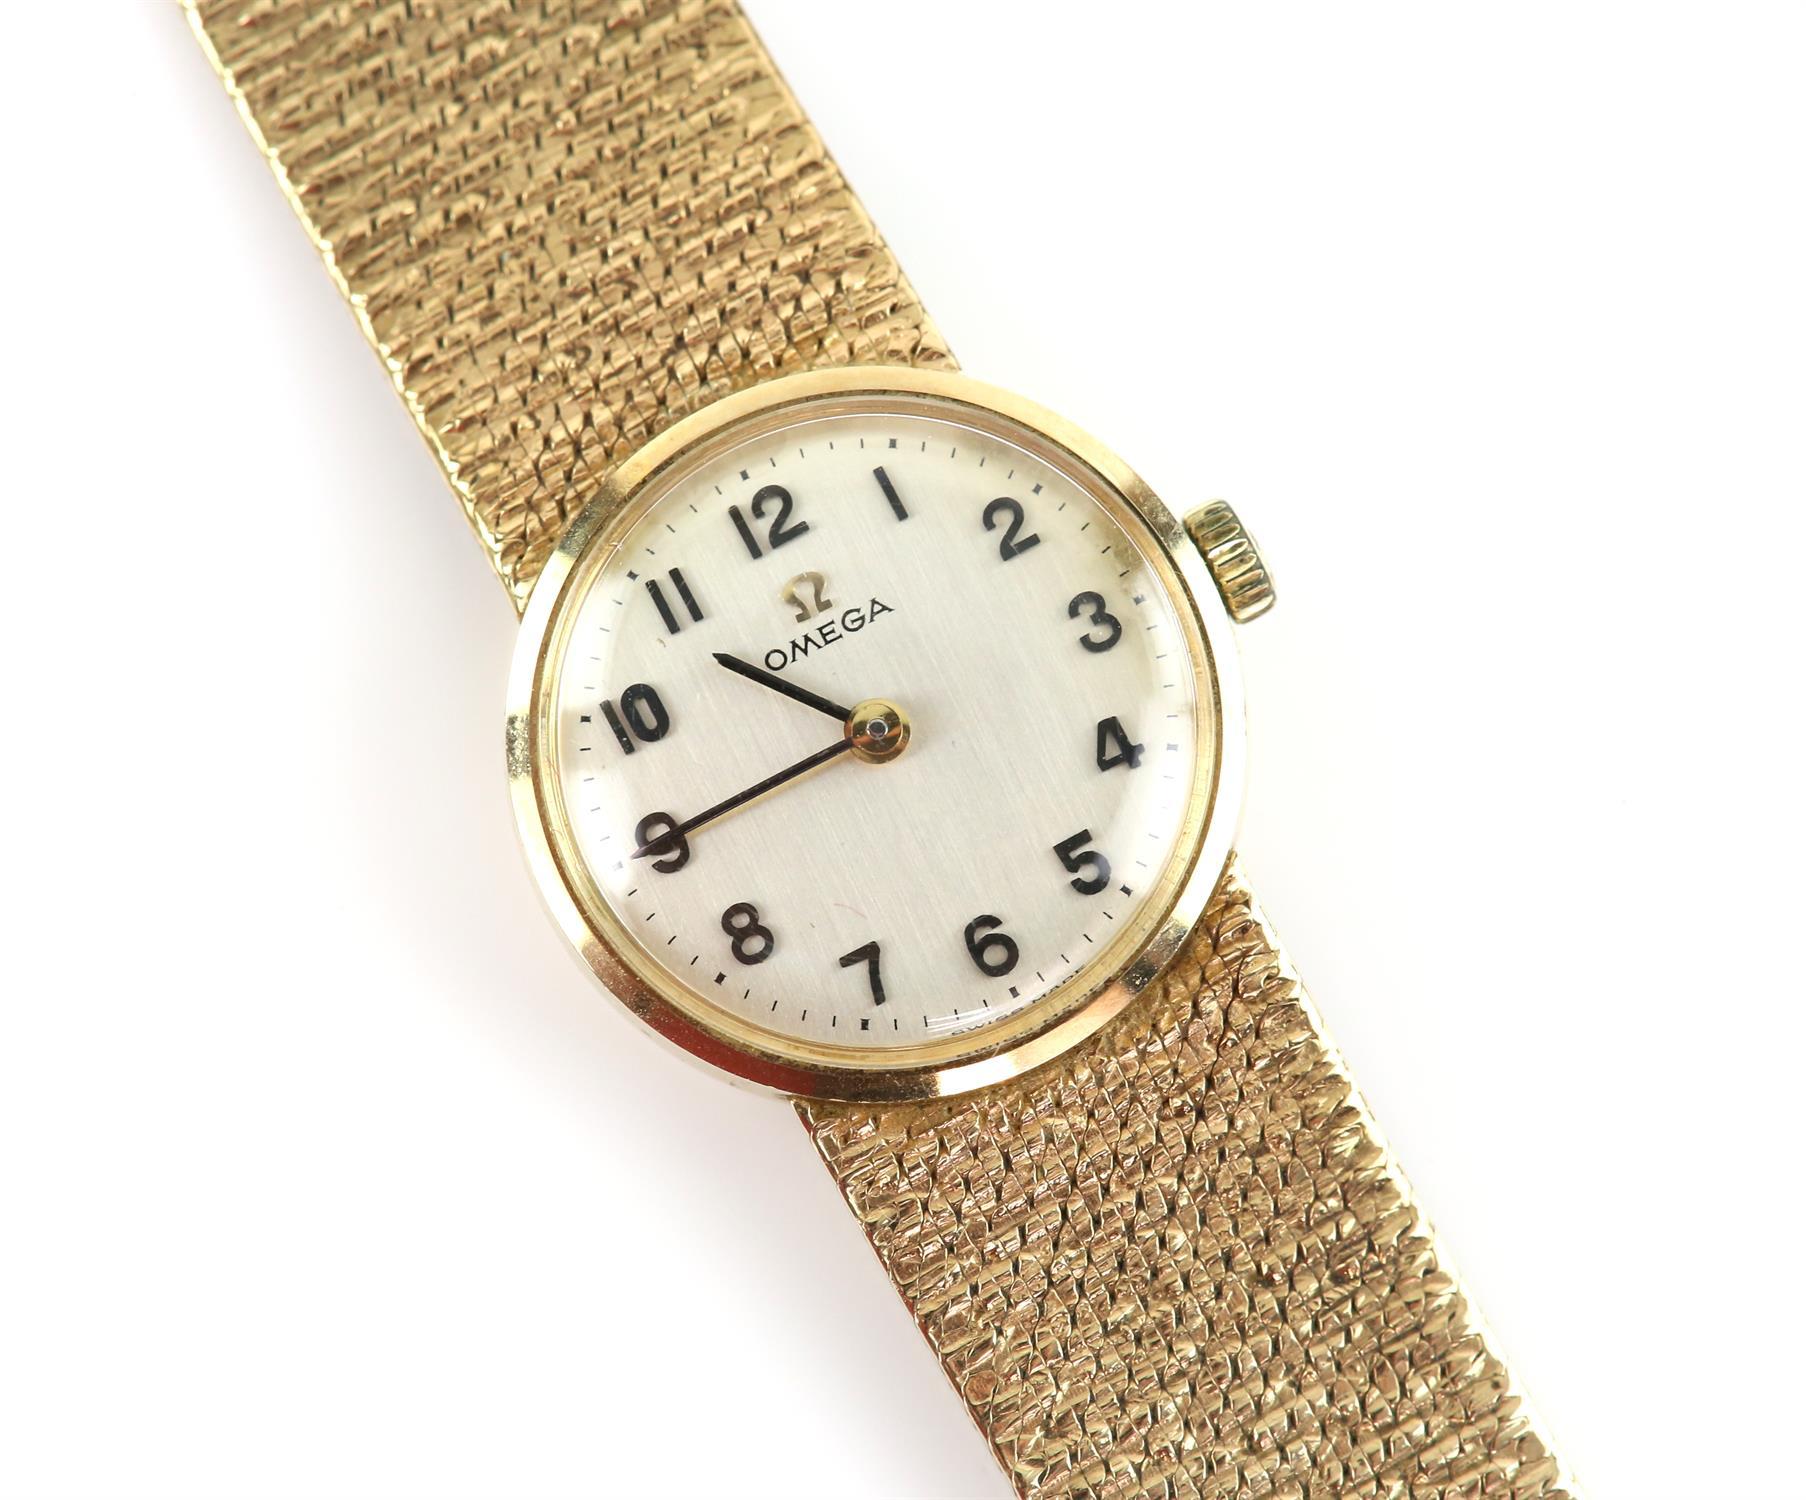 Vintage Omega watch, quartz movement, bracelet strap with textured bark finish, satin finish off - Image 2 of 3